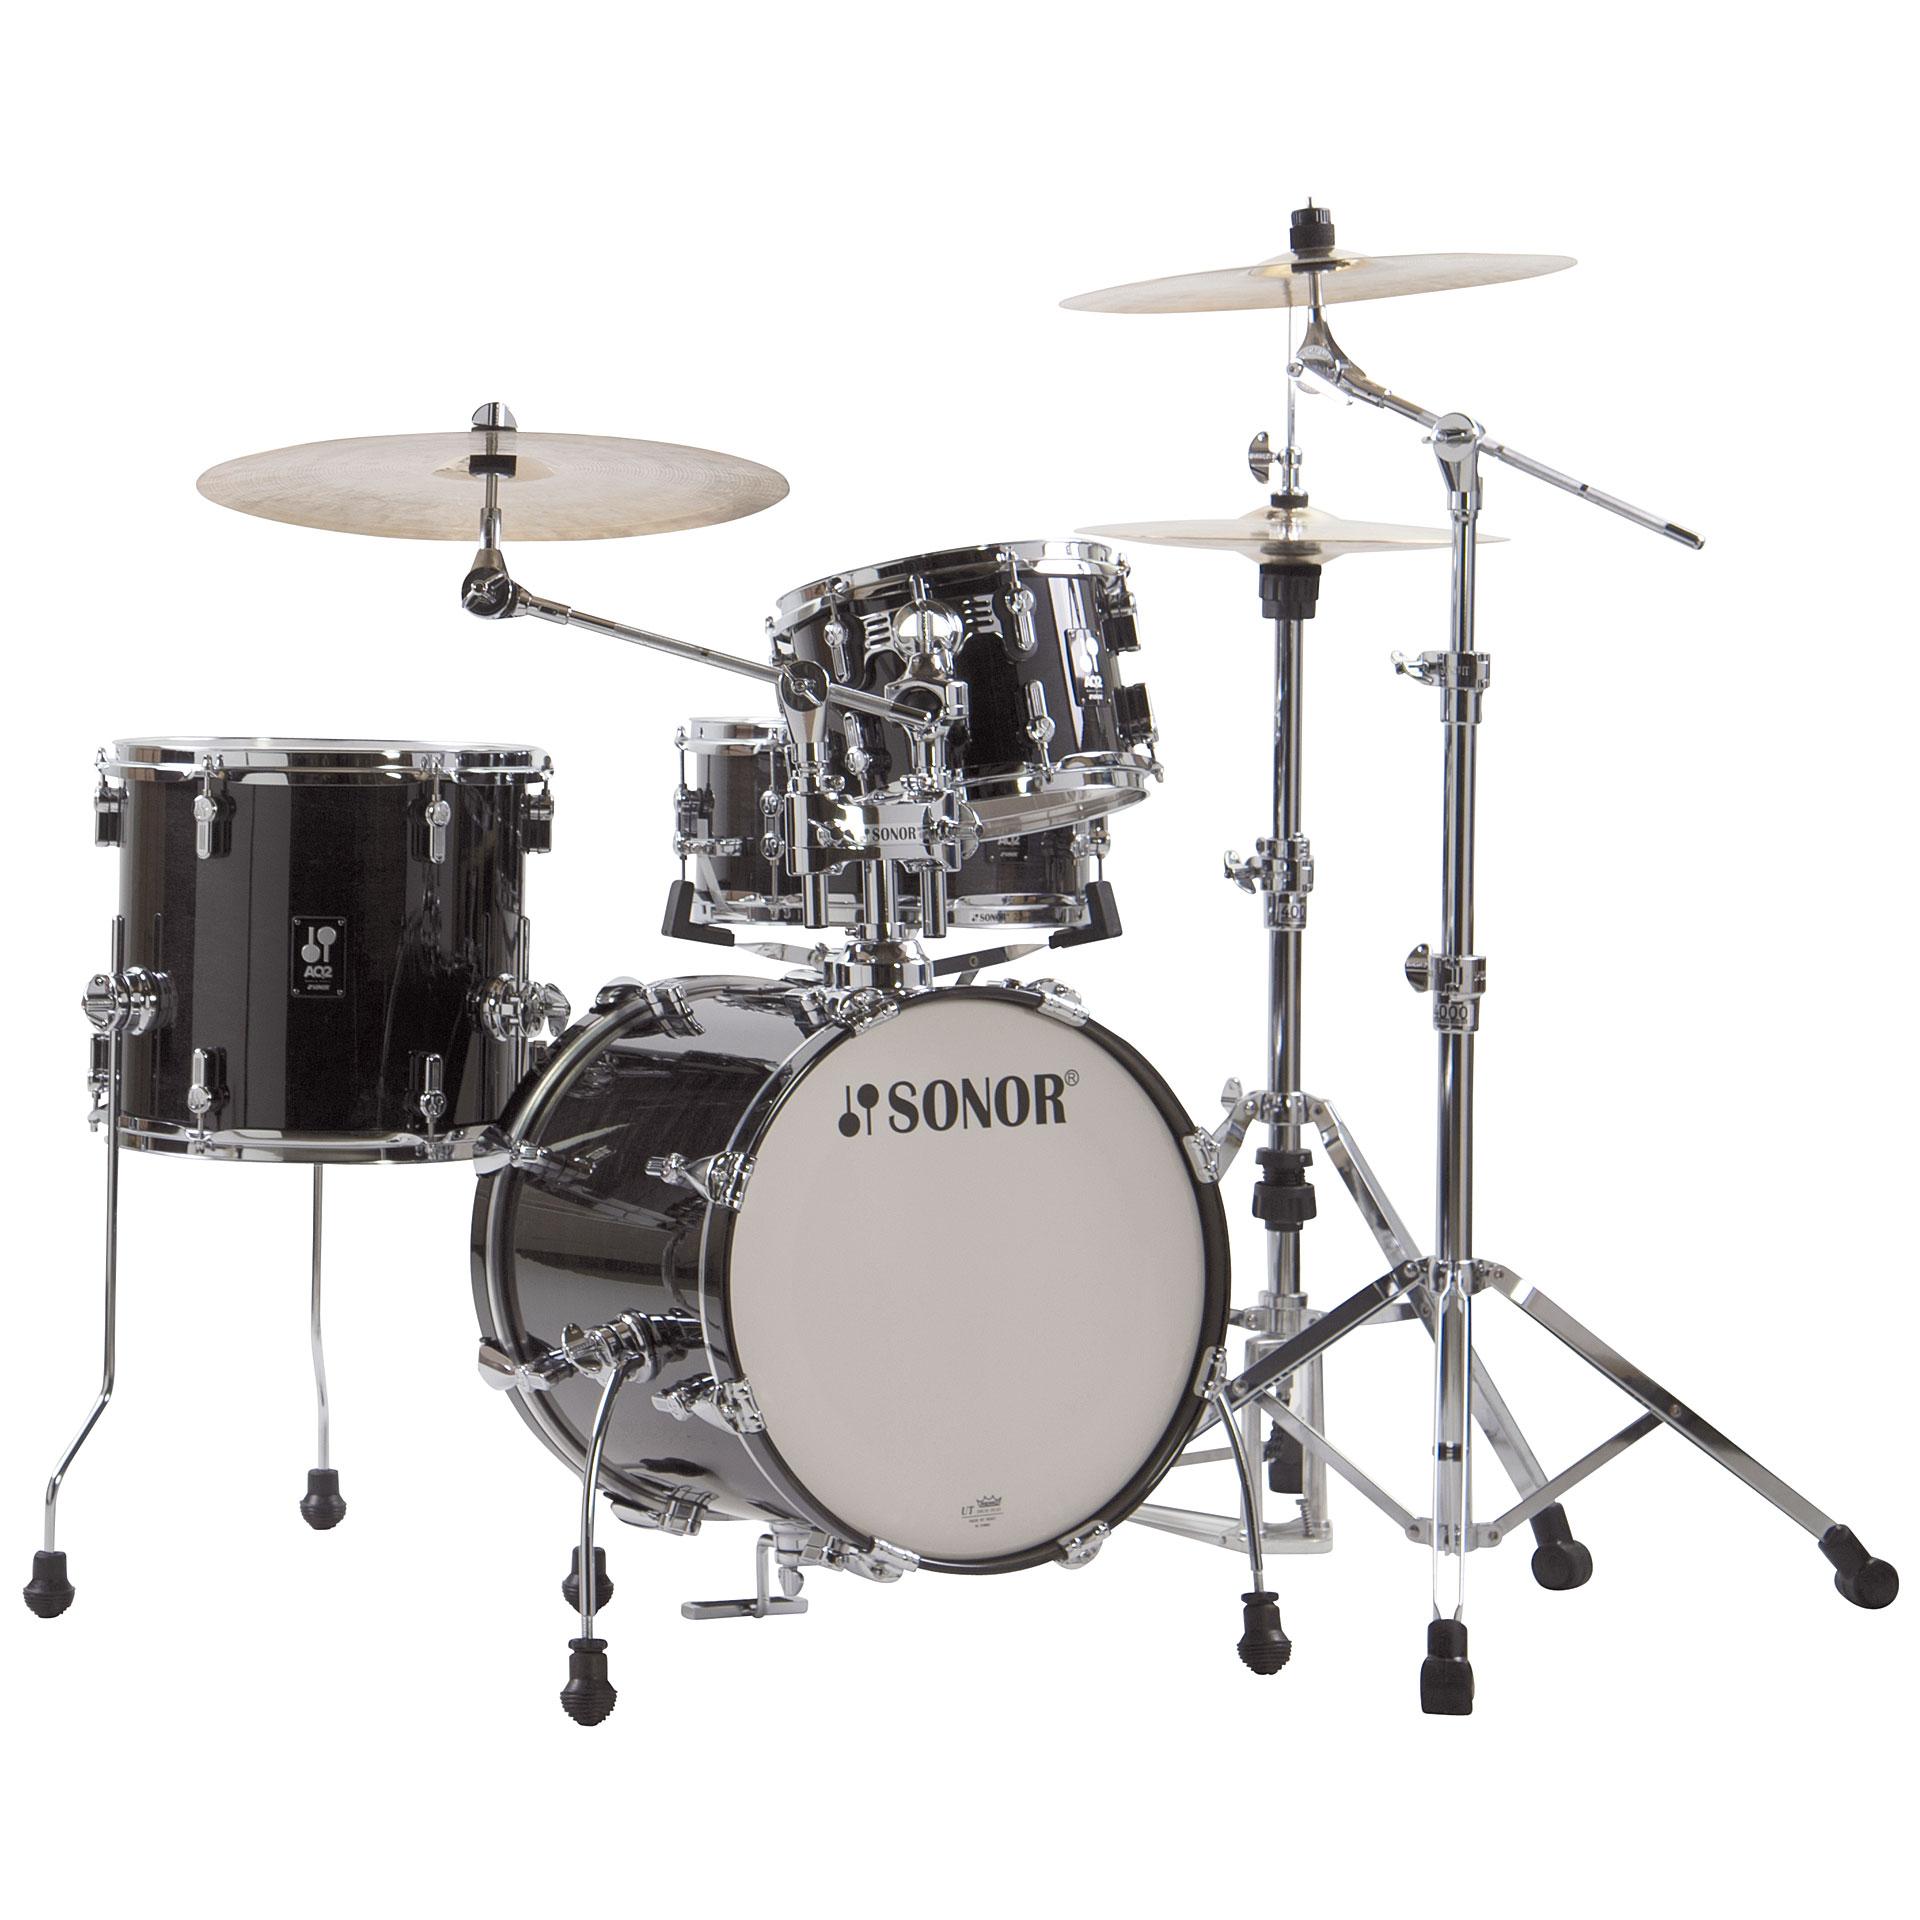 Schlagzeug Sonor AQ2 16 Transparent Black Safari Drumset